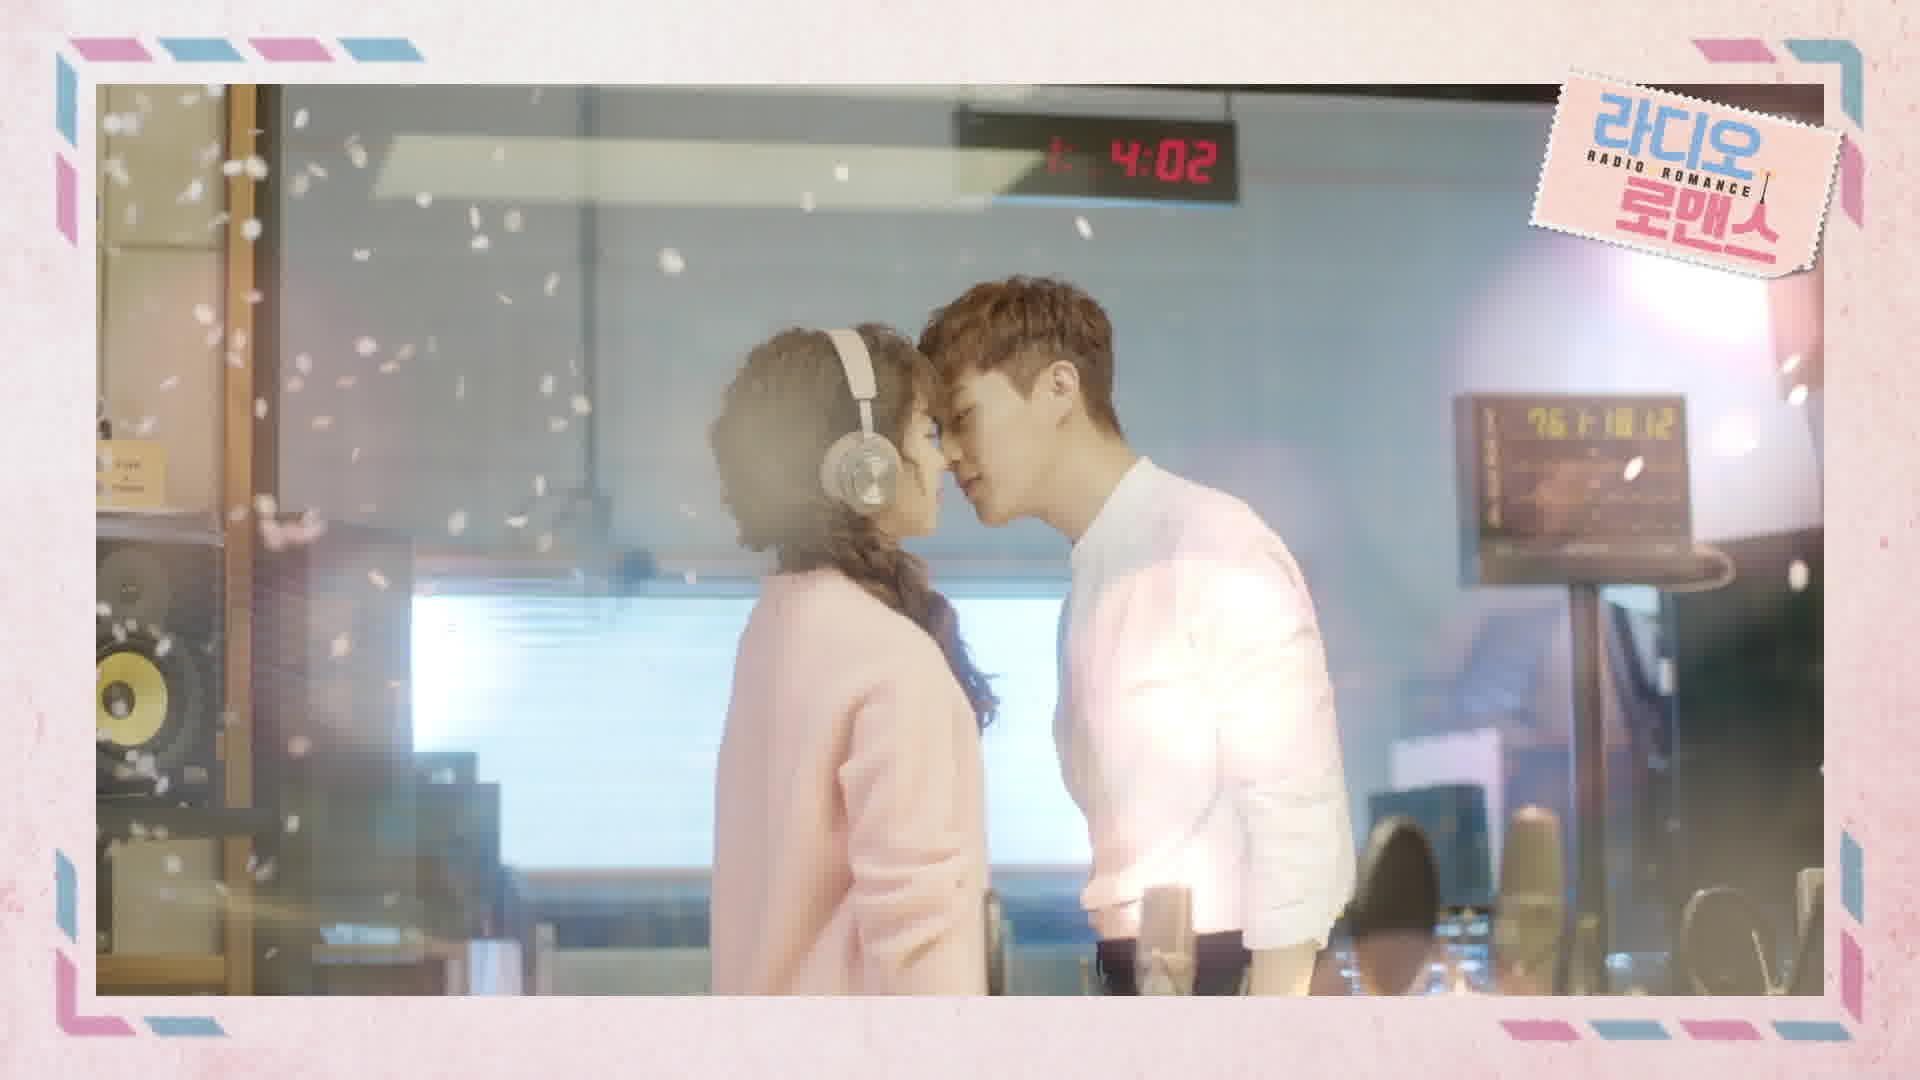 Radio Romance - 라디오 로맨스 - Watch Full Episodes Free